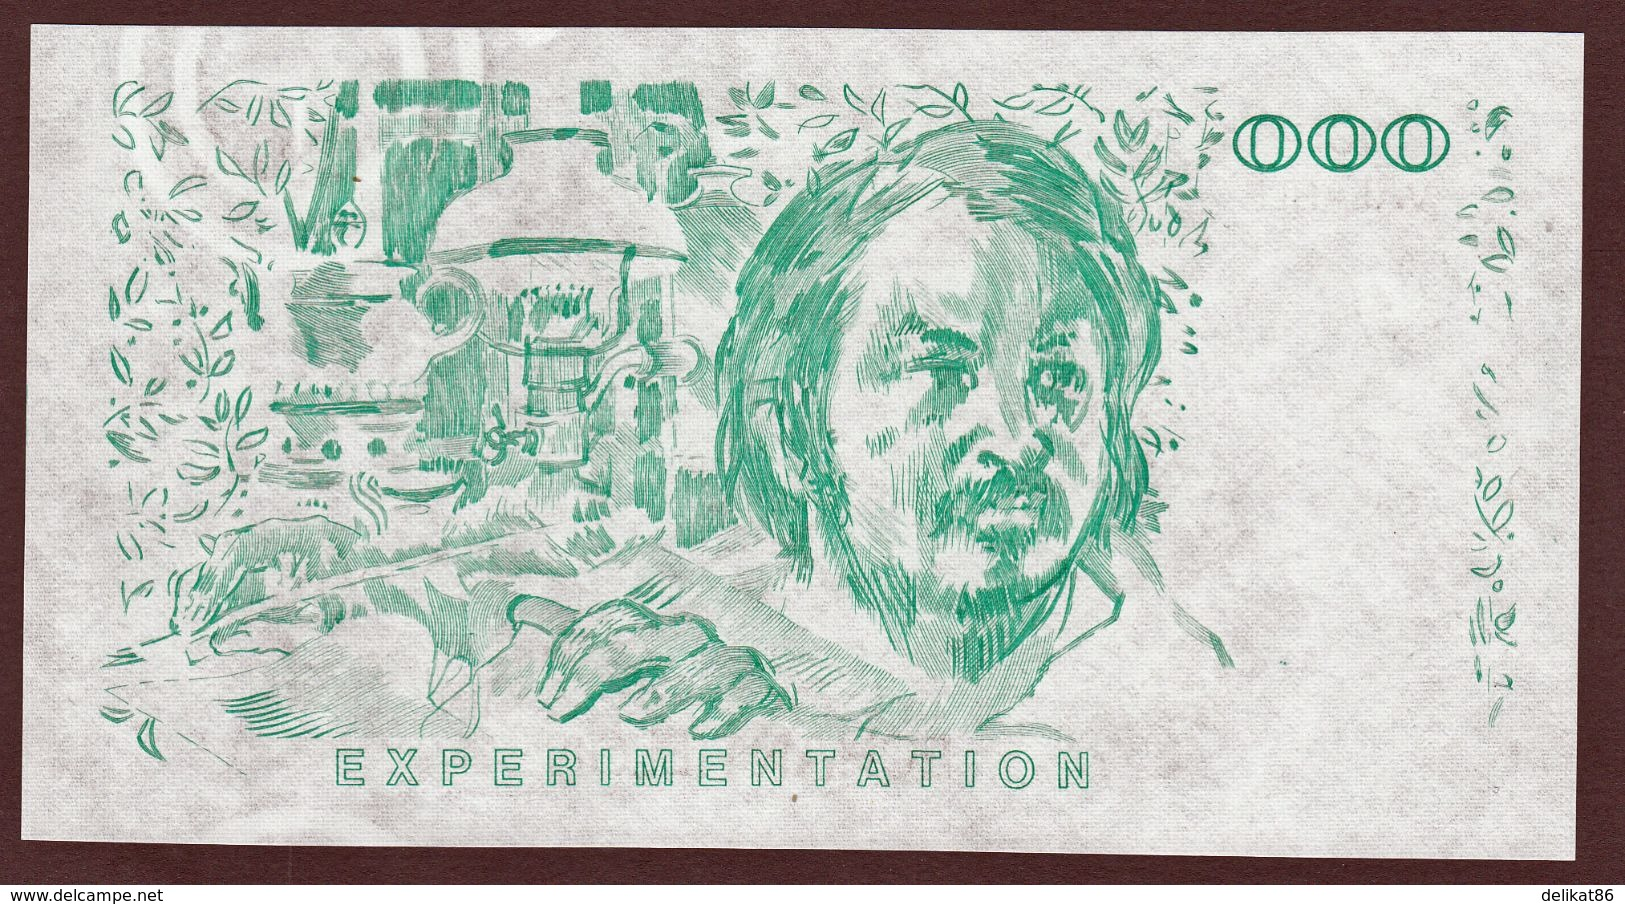 Probedruck Testbanknote Specimen Frankreich 1988 Echantillion Balzac - Ficción & Especímenes